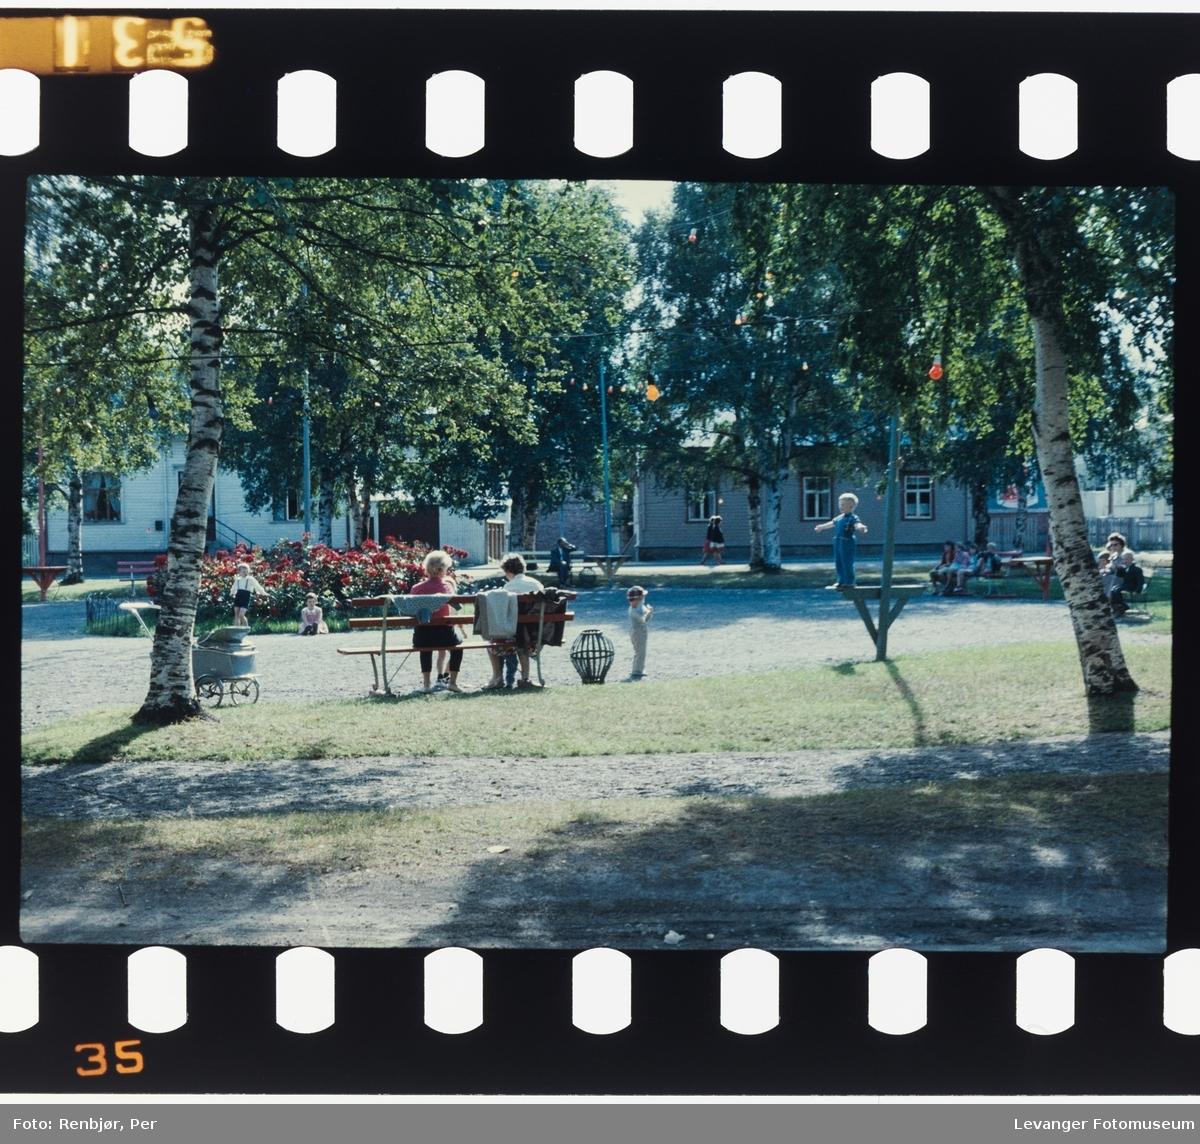 Barn leker i parken, mens de voksne prater.